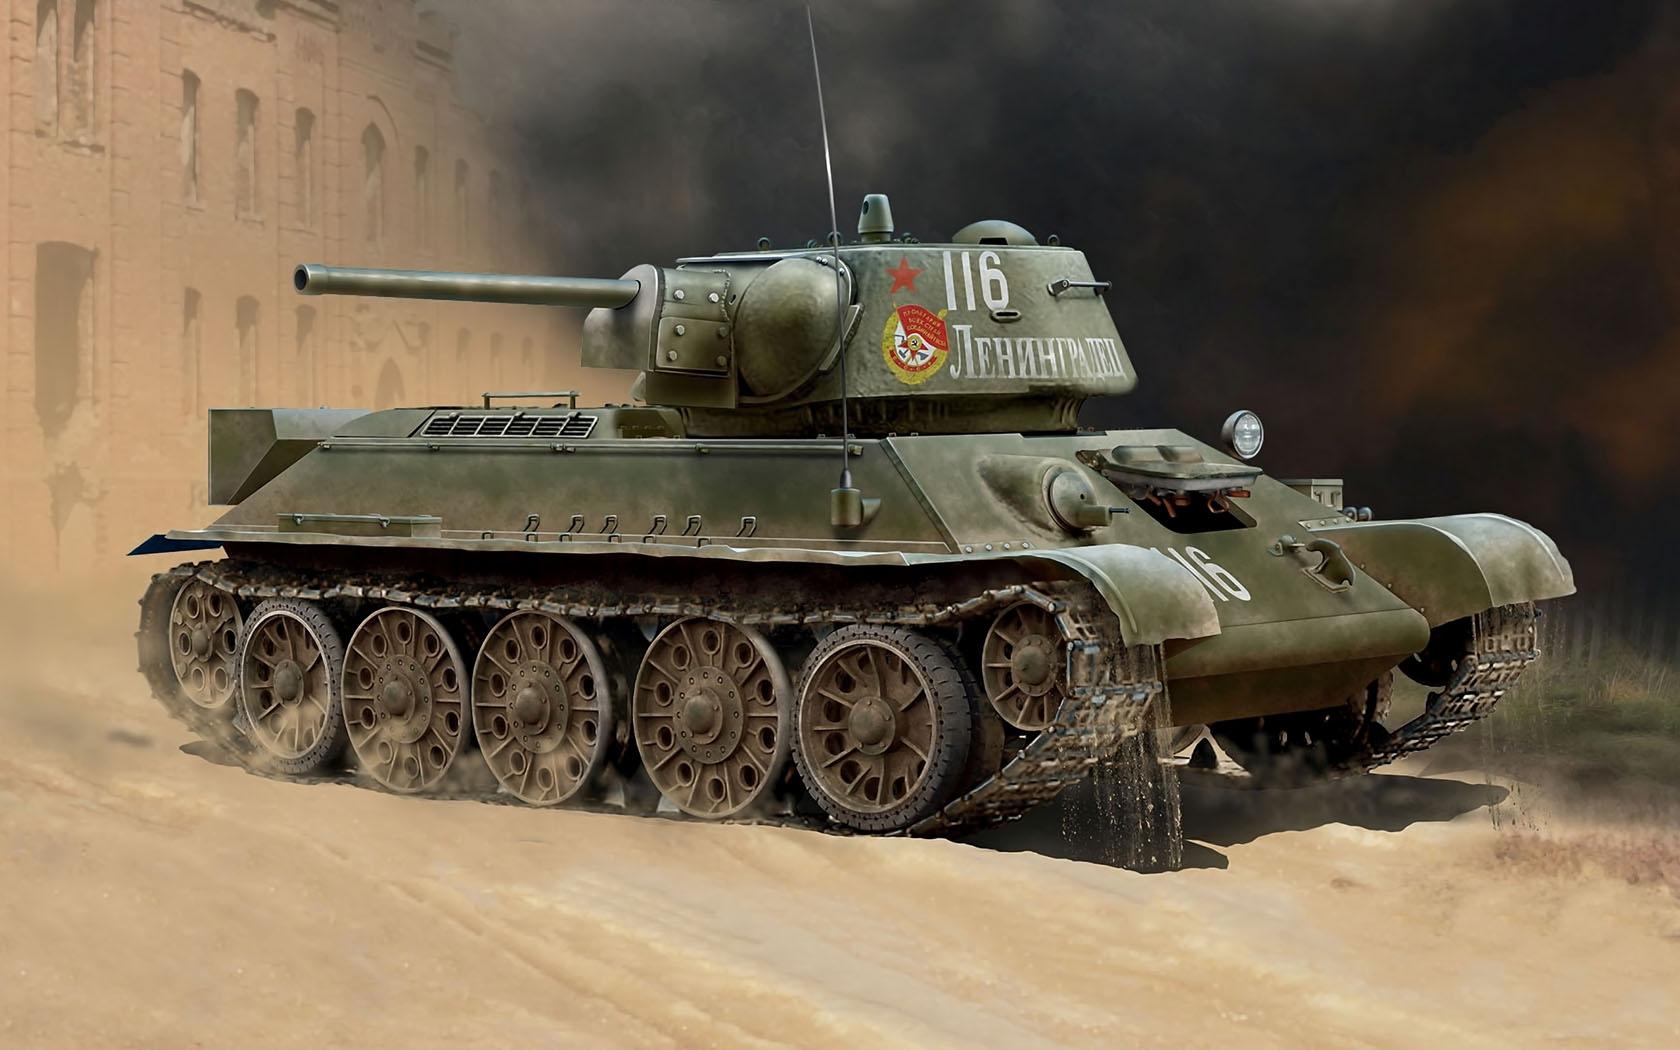 рисунок Т-34-76 ленинградец